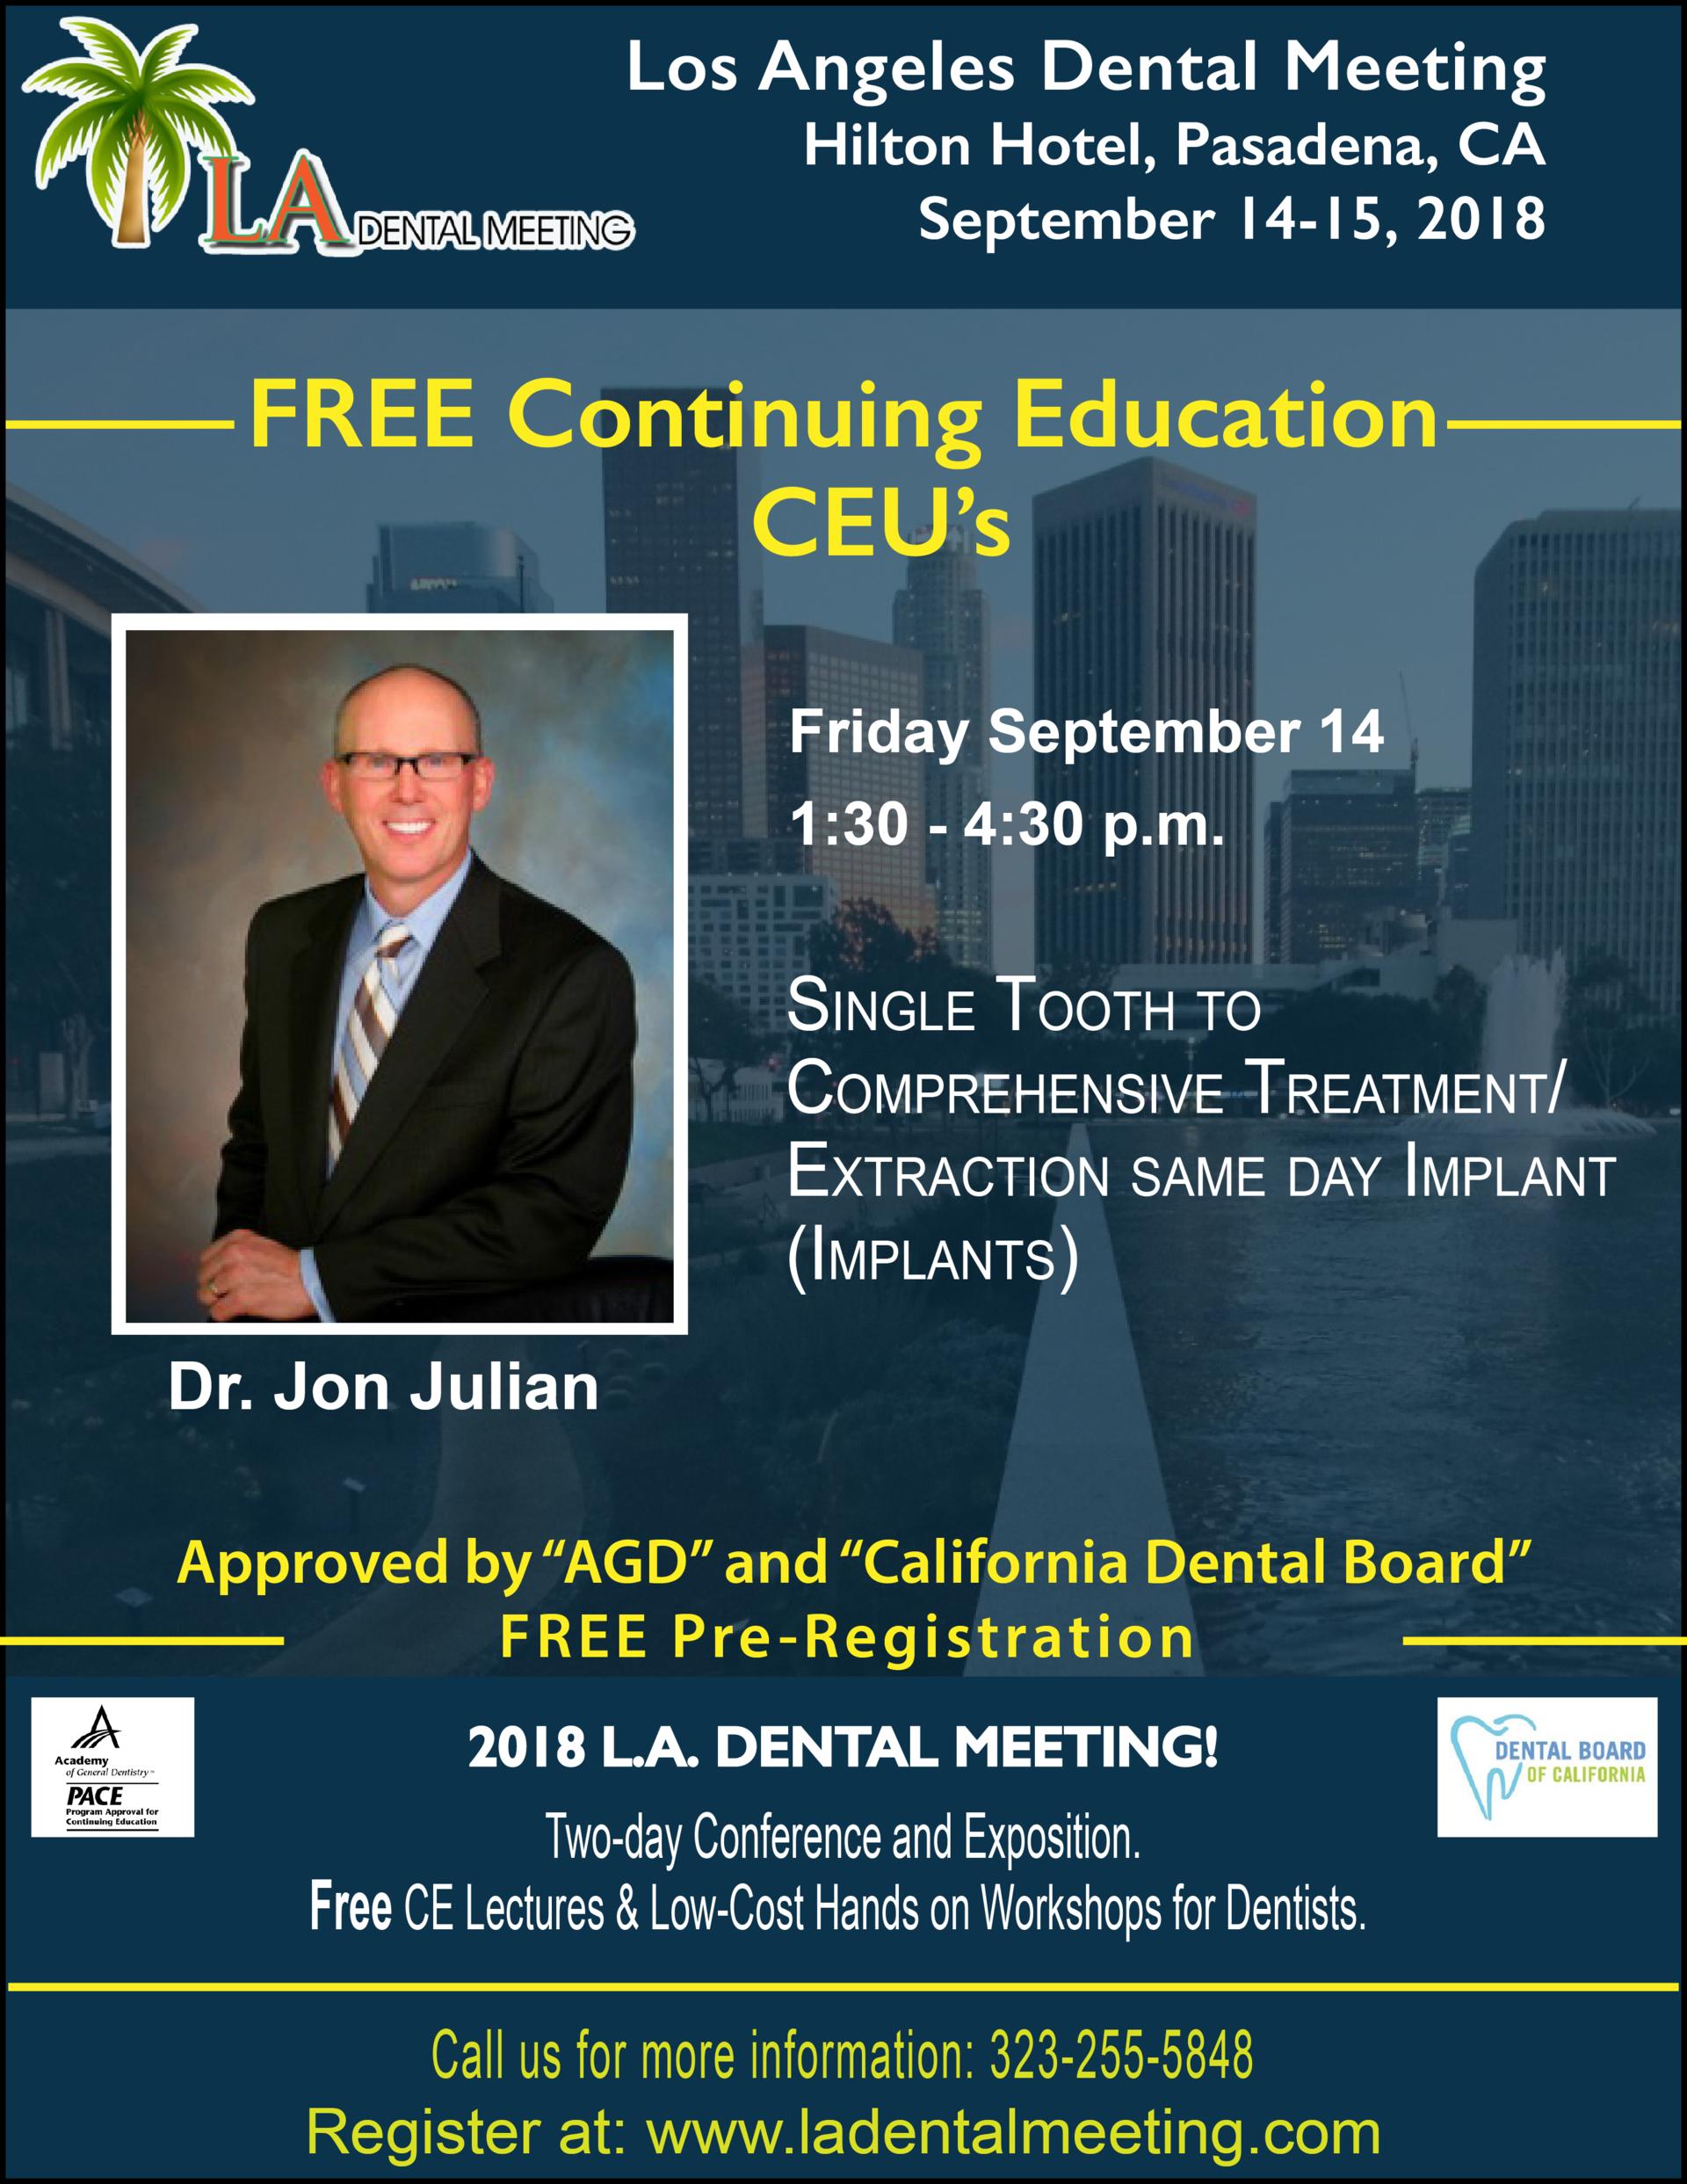 LA Dental Meeting 2018